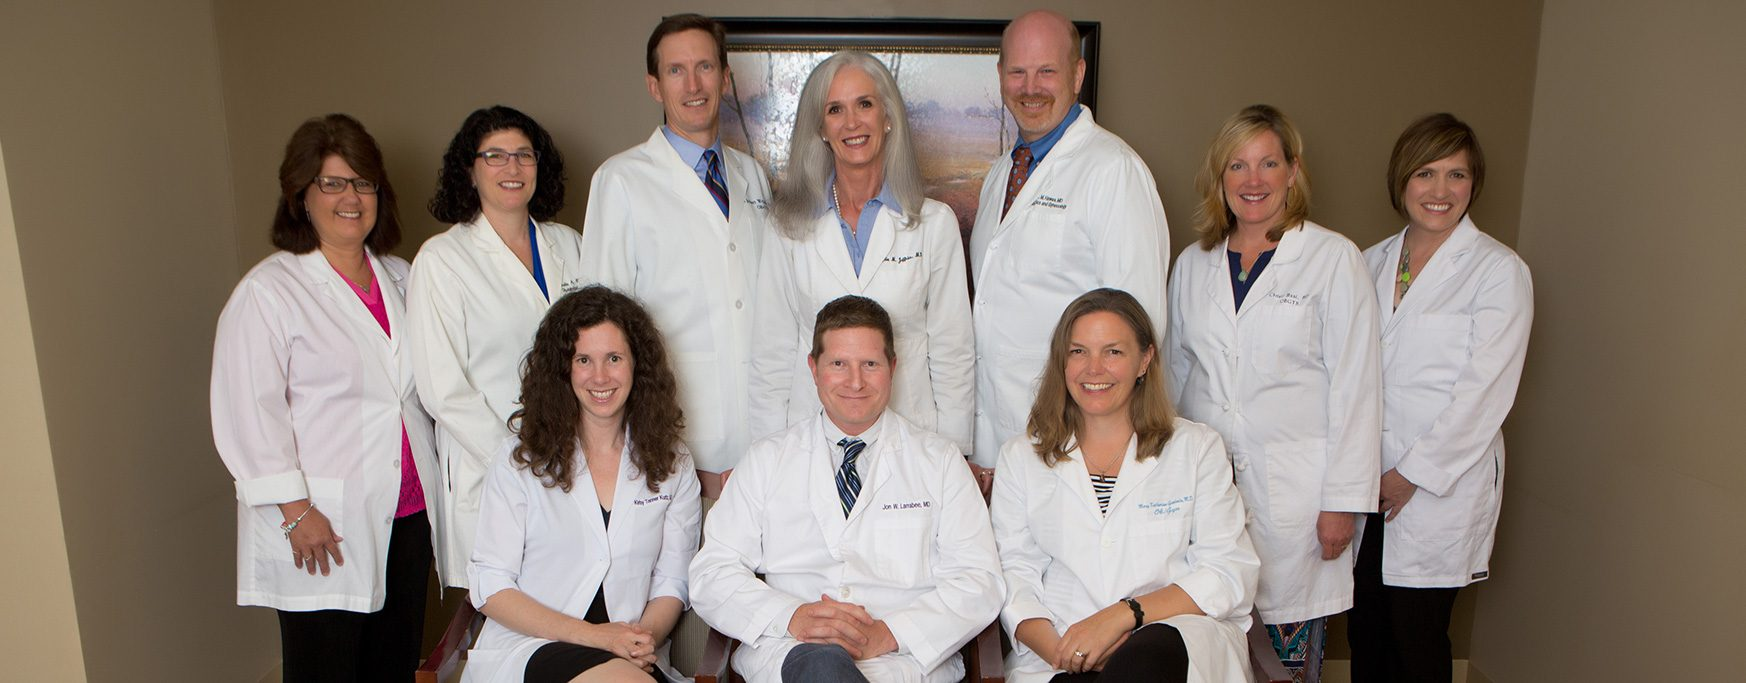 asheville-womens-medical-ob-gyn